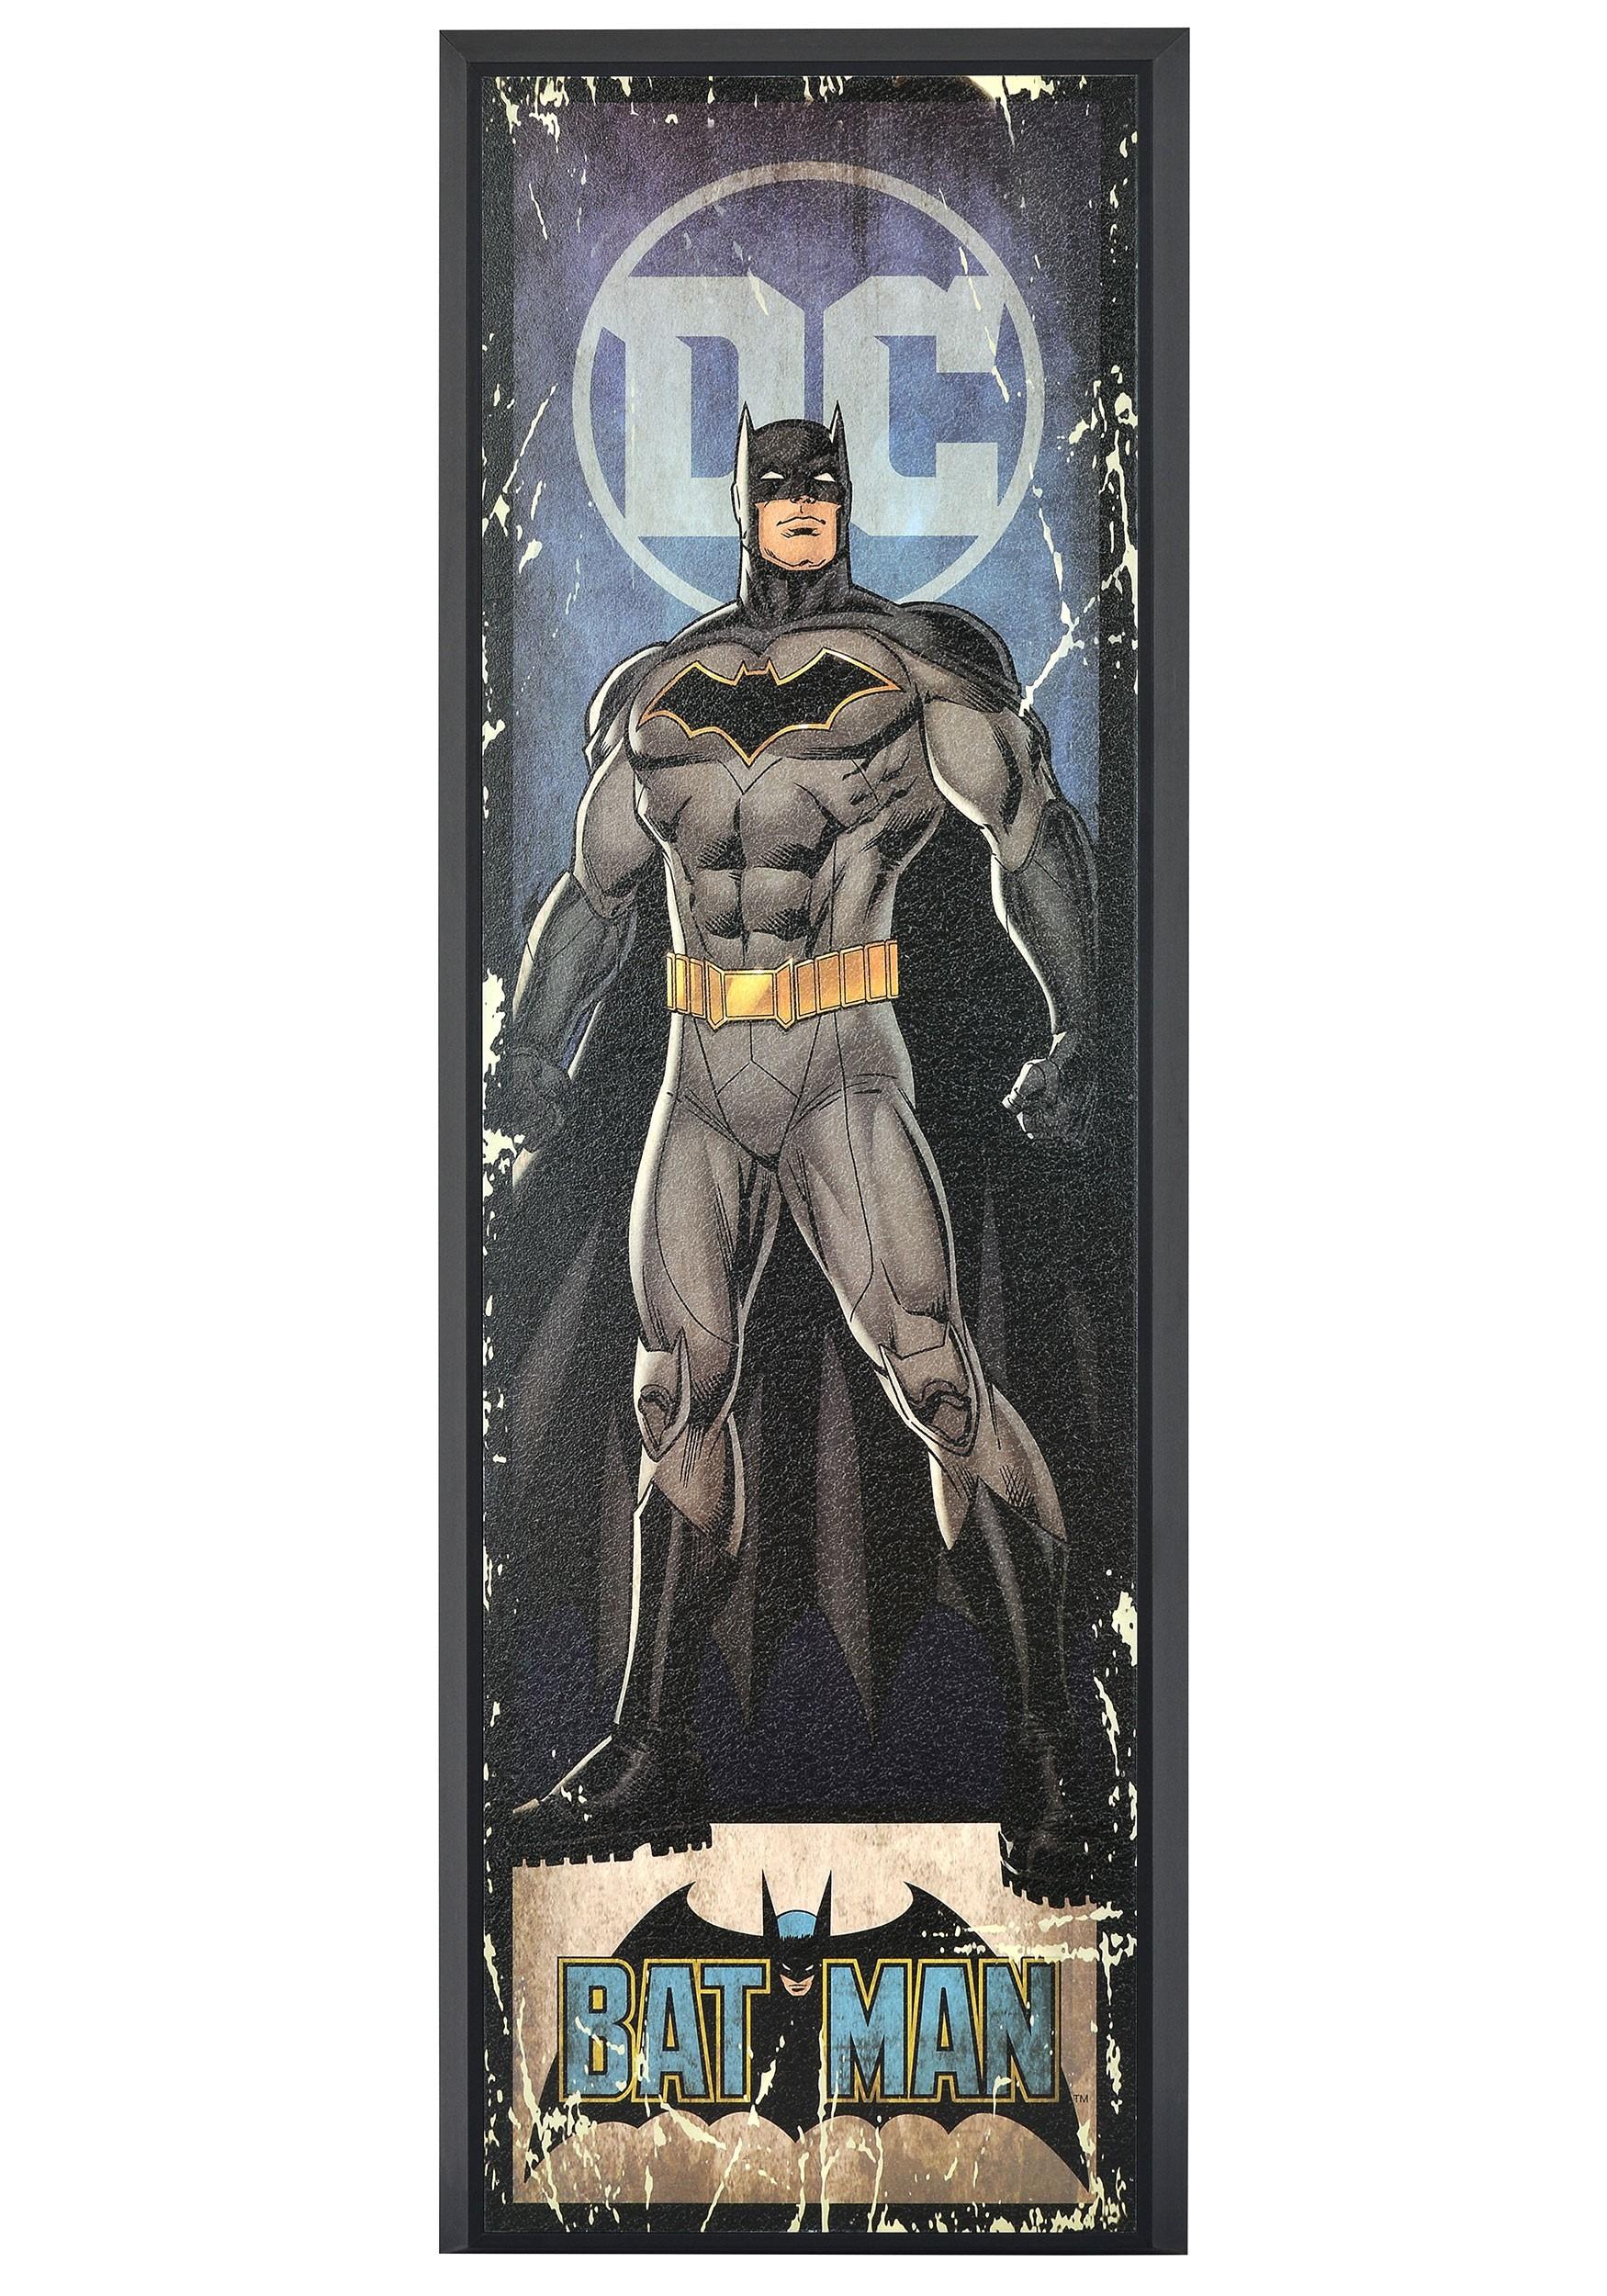 Zombie Batman Framed Art Original Drawing Batman in a Suit Gothic Home Decor Cubicle Decor Occult Fandom DC Comics Wall Art